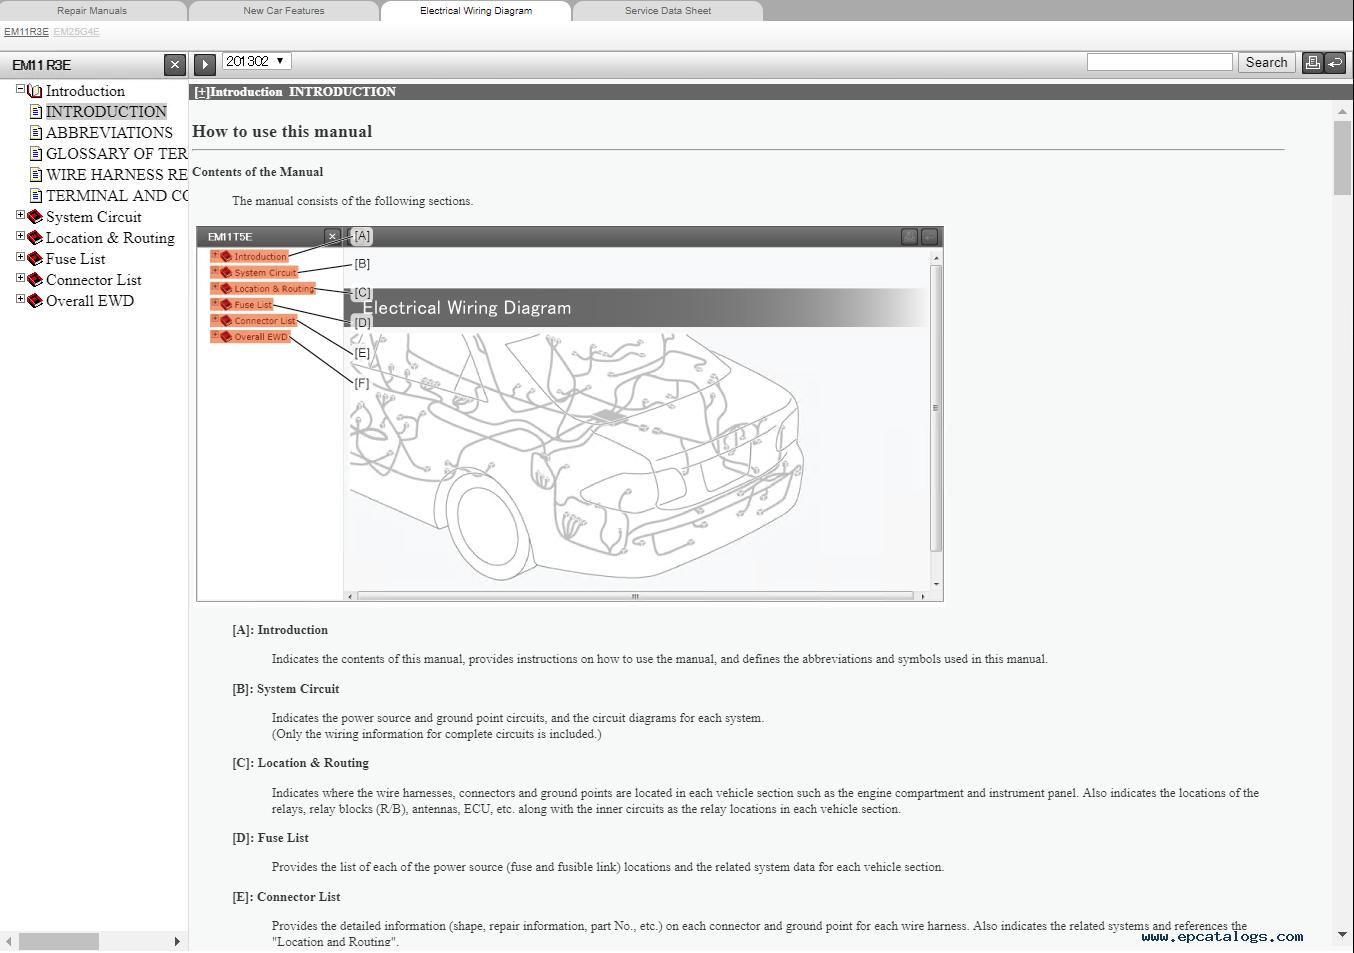 toyota wiring diagram 2014 corolla toyota avensis petrol azt270 zrt270 271 272 repair manual